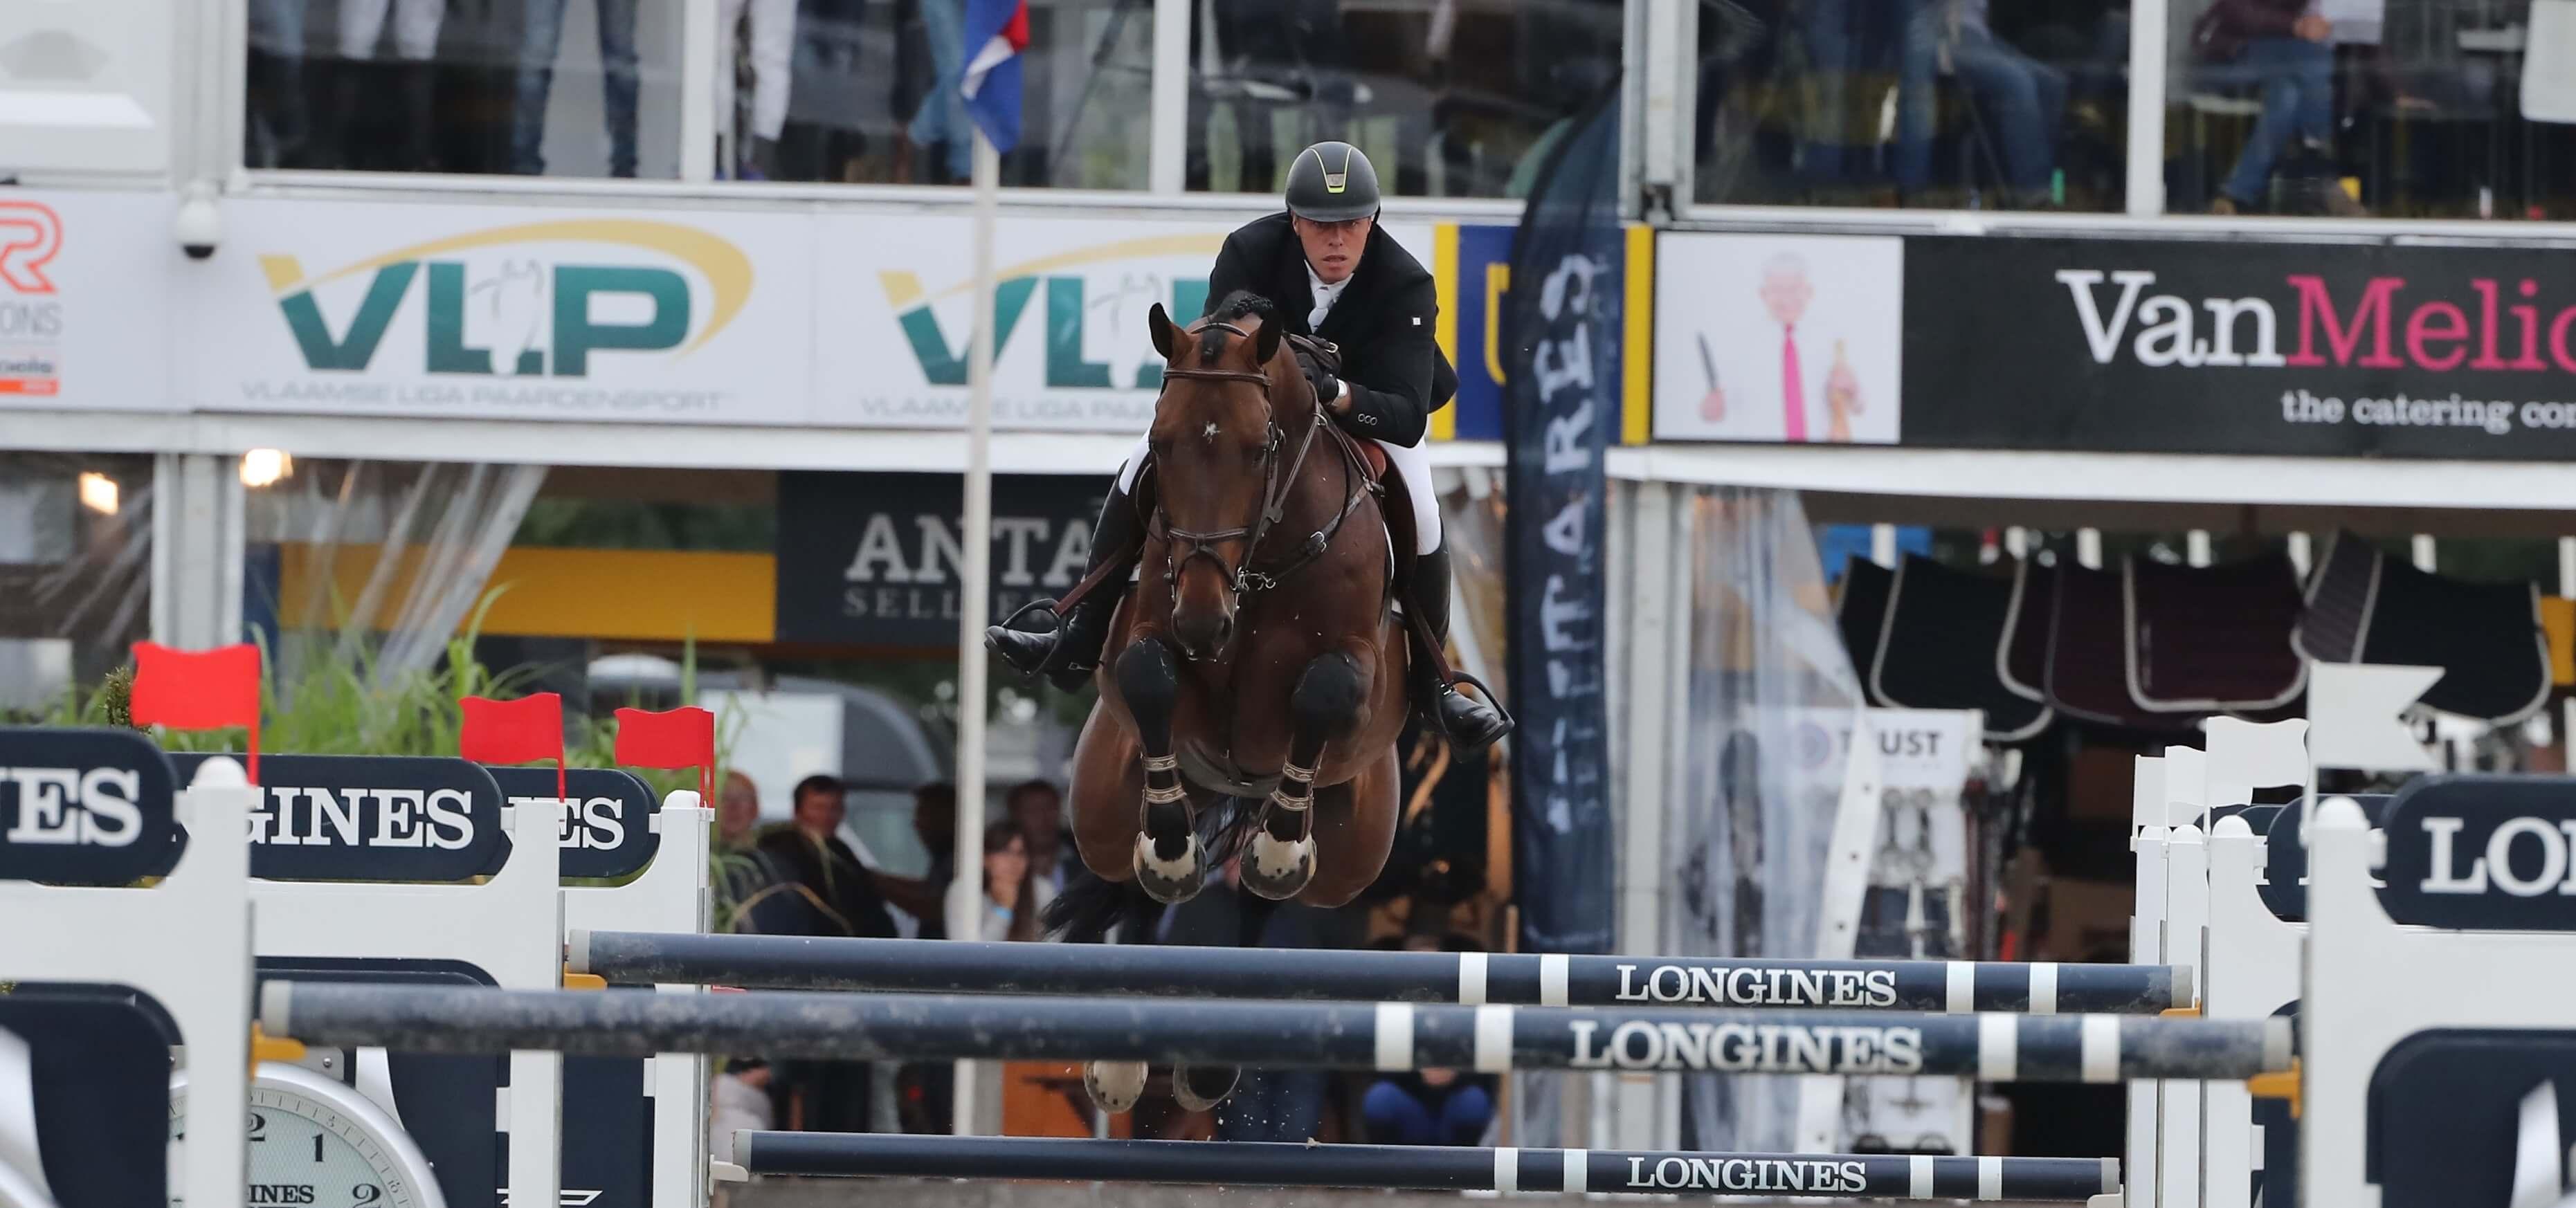 Exquisite start of the Stallions at Jumping Mechelen!